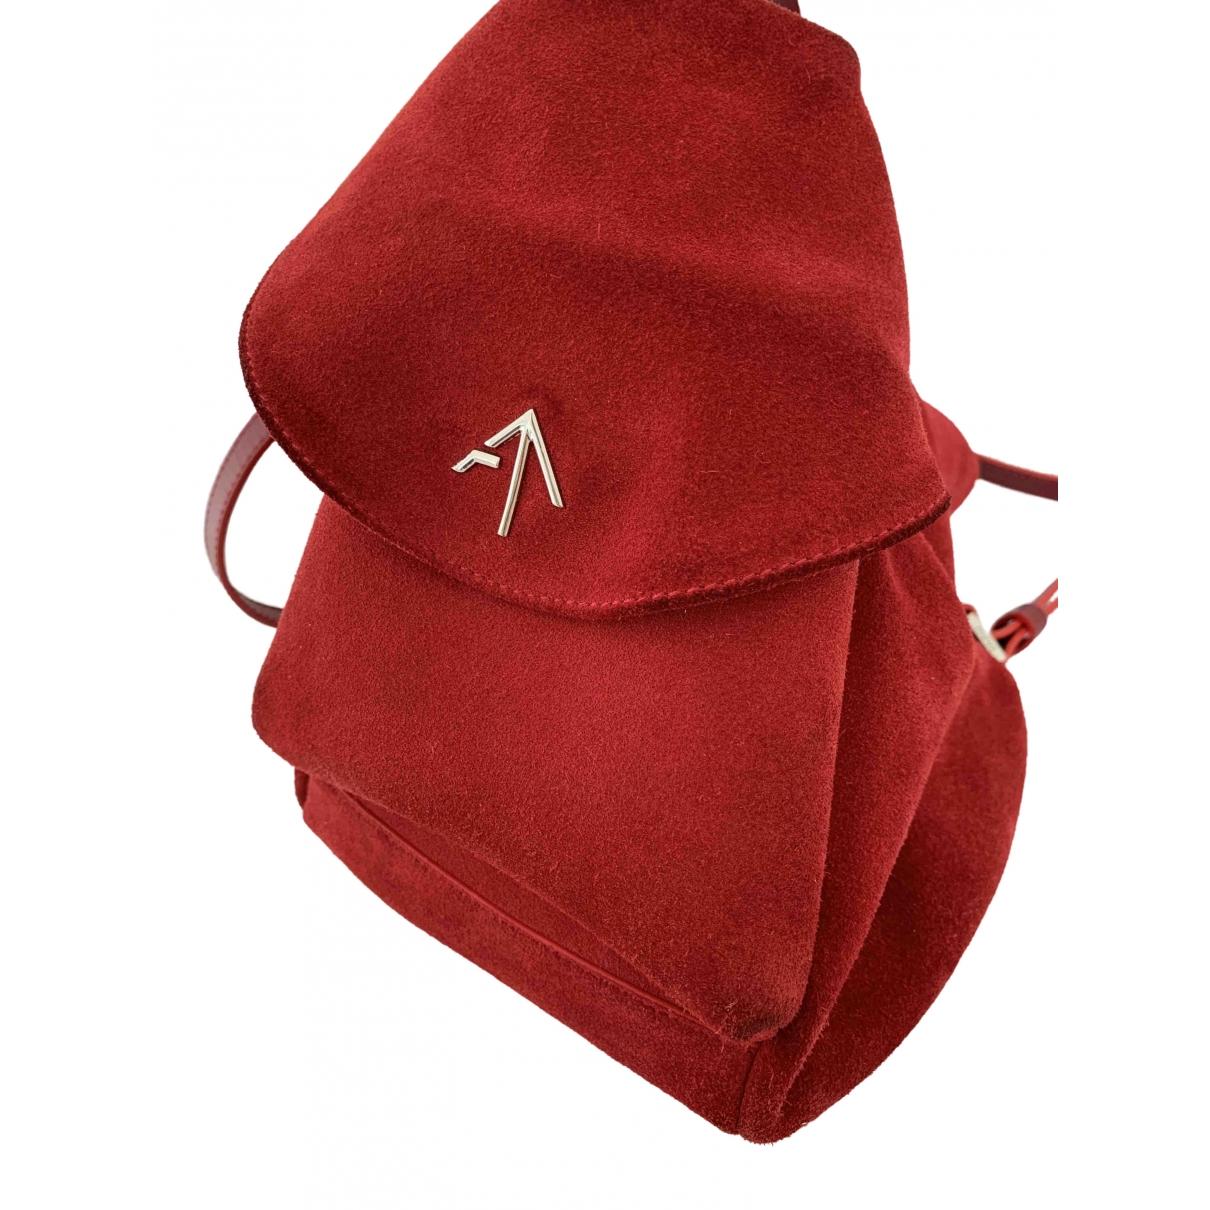 Manu Atelier \N Red Suede backpack for Women \N